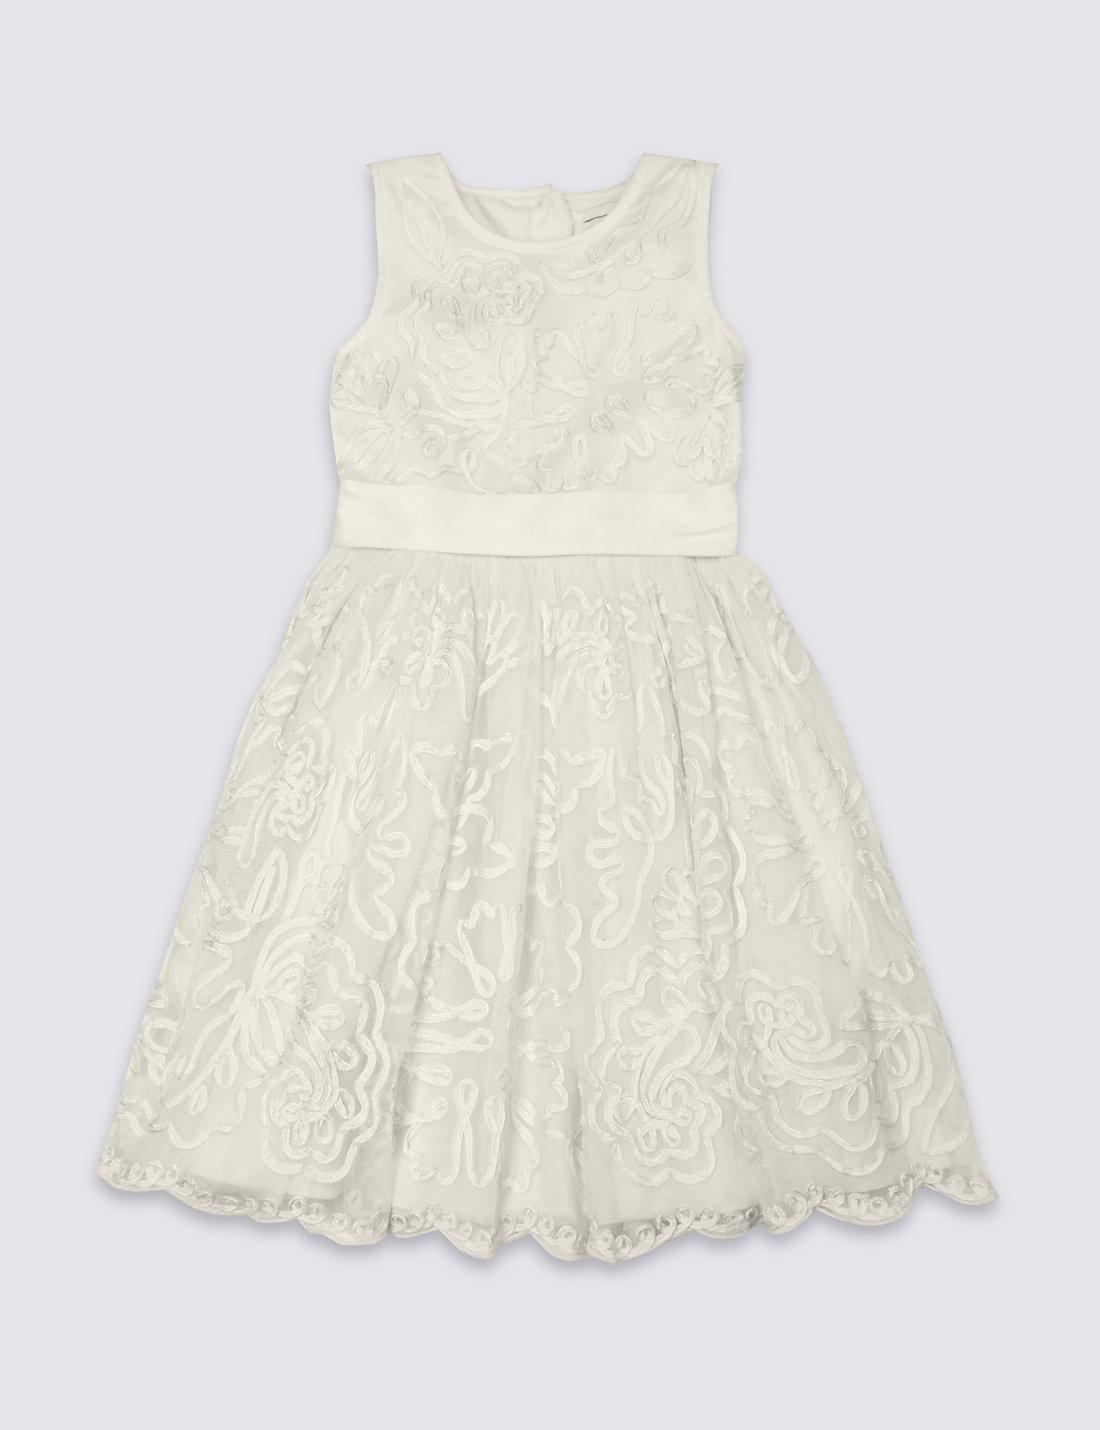 Cornelli Dress at M&S